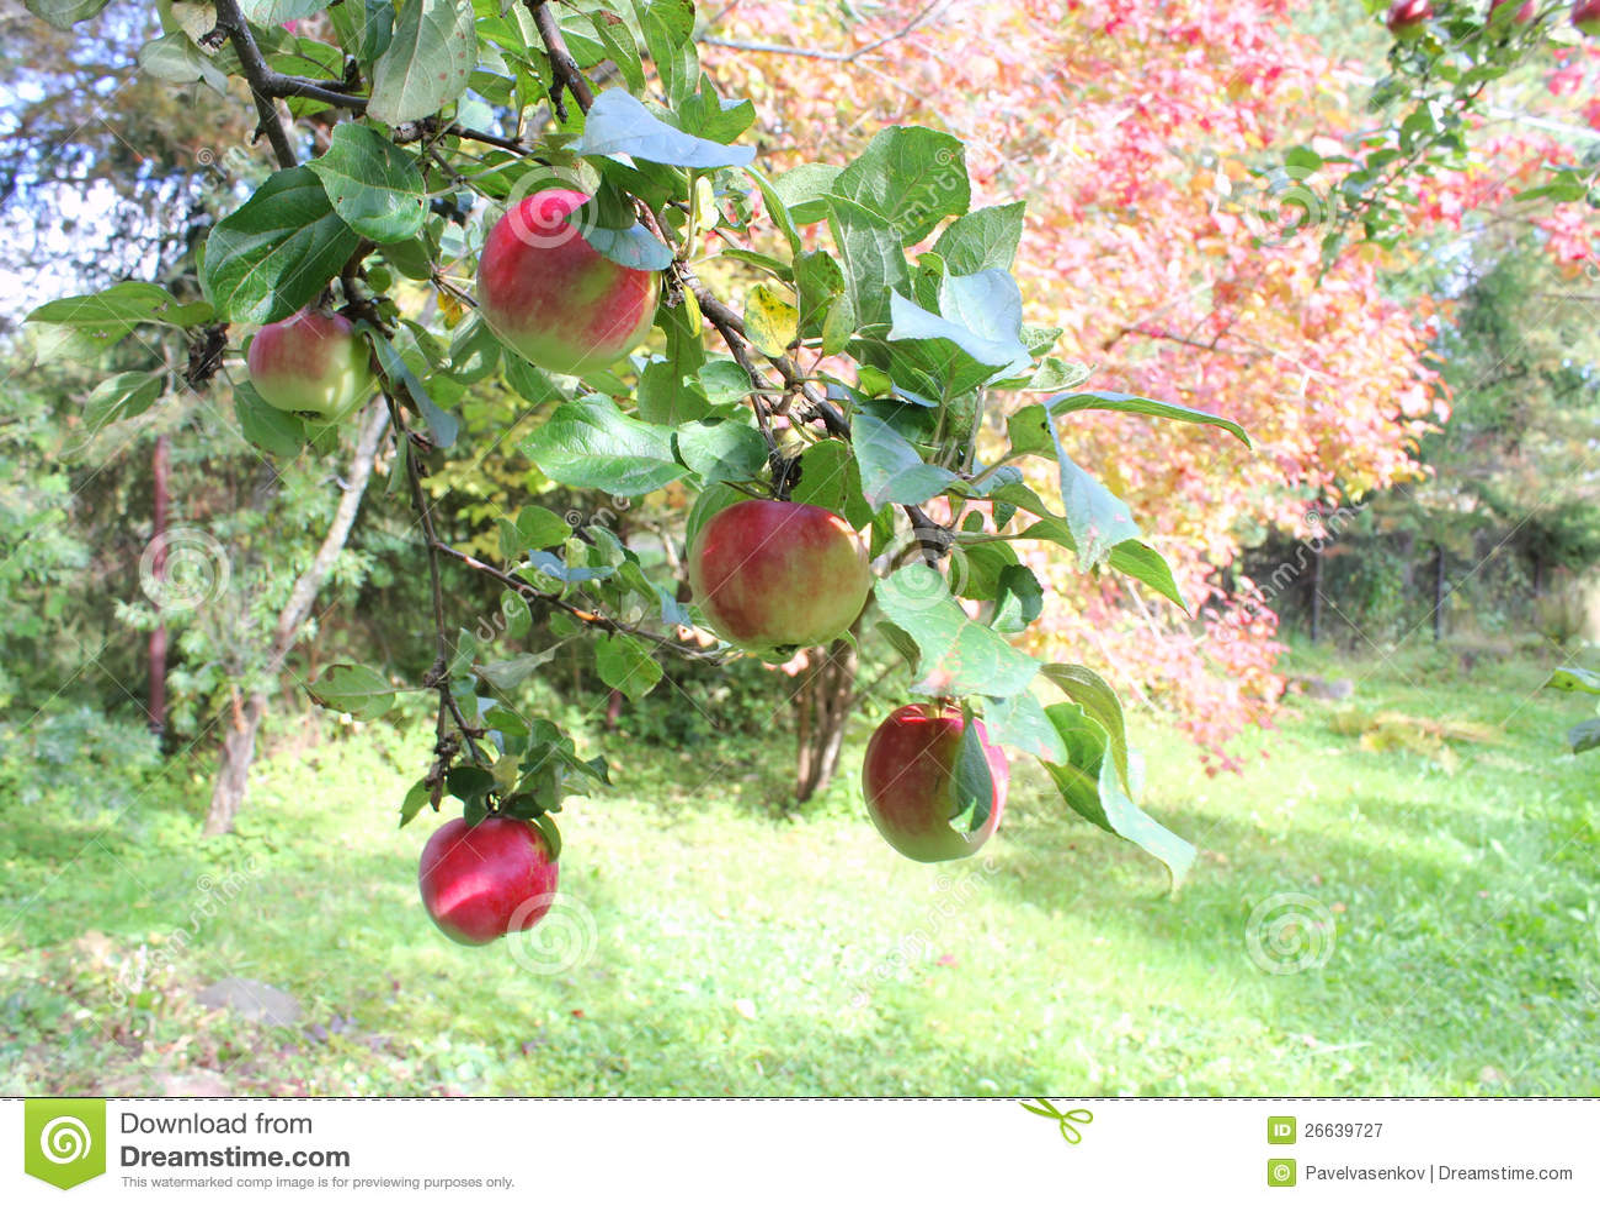 Herbst garten lizenzfreie stockfotografie bild 26639727 - Herbst garten ...